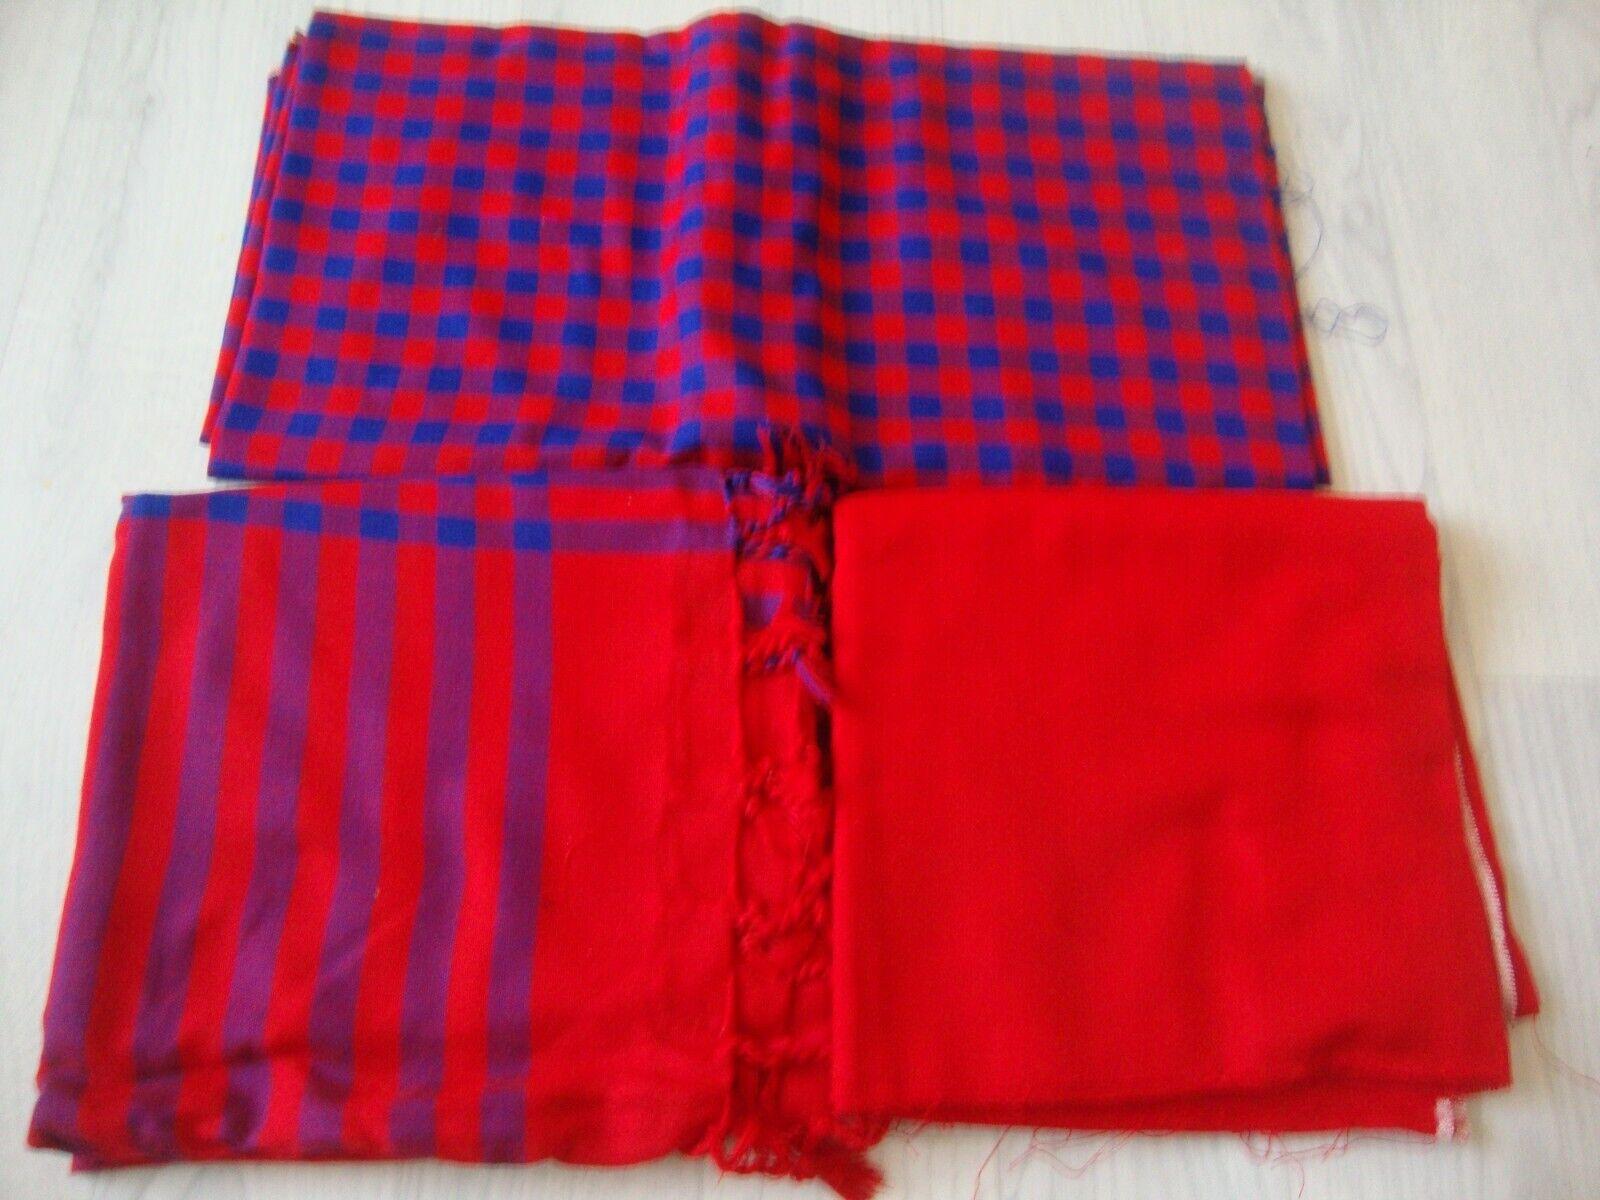 Acrylic Wool 3pc unstitched salwar kameez indian pakistani modern check design